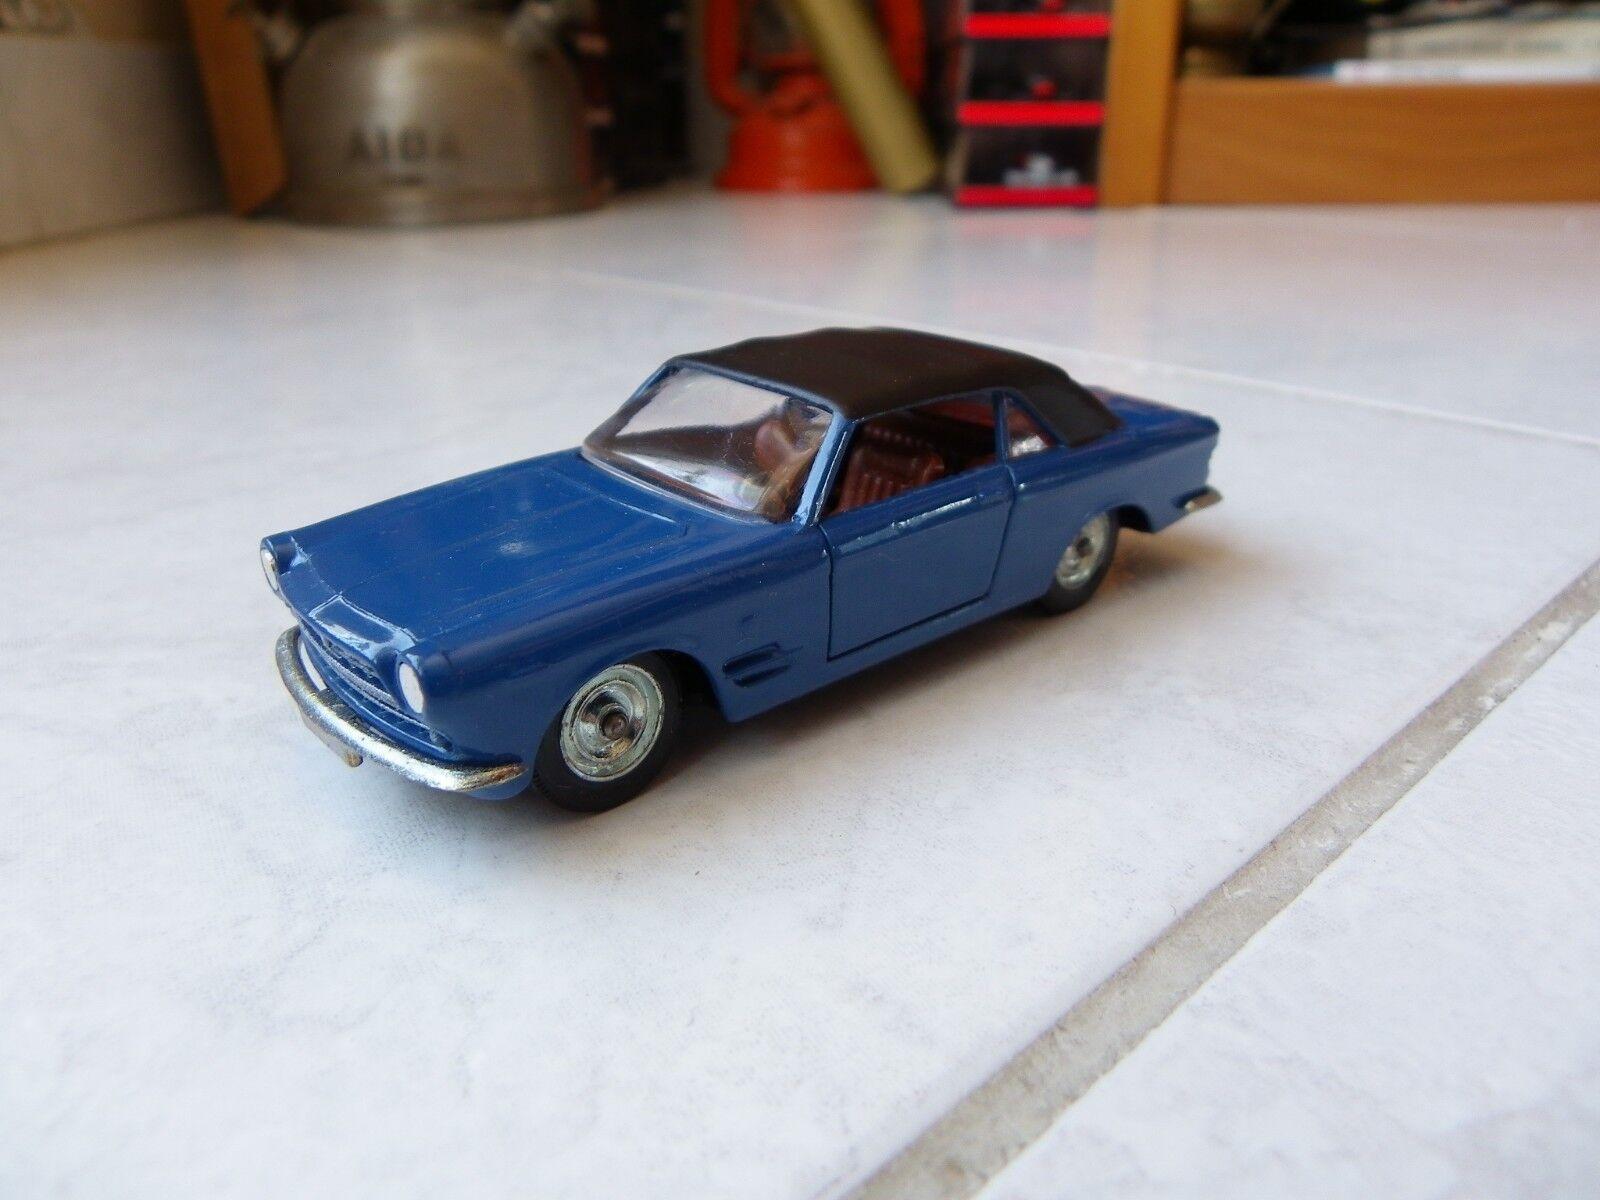 Fiat 2300 S Cabriolet Ghia Ref 133 133 133 3/64 Solido 1/43 jouet miniature ancien 9c4bc0